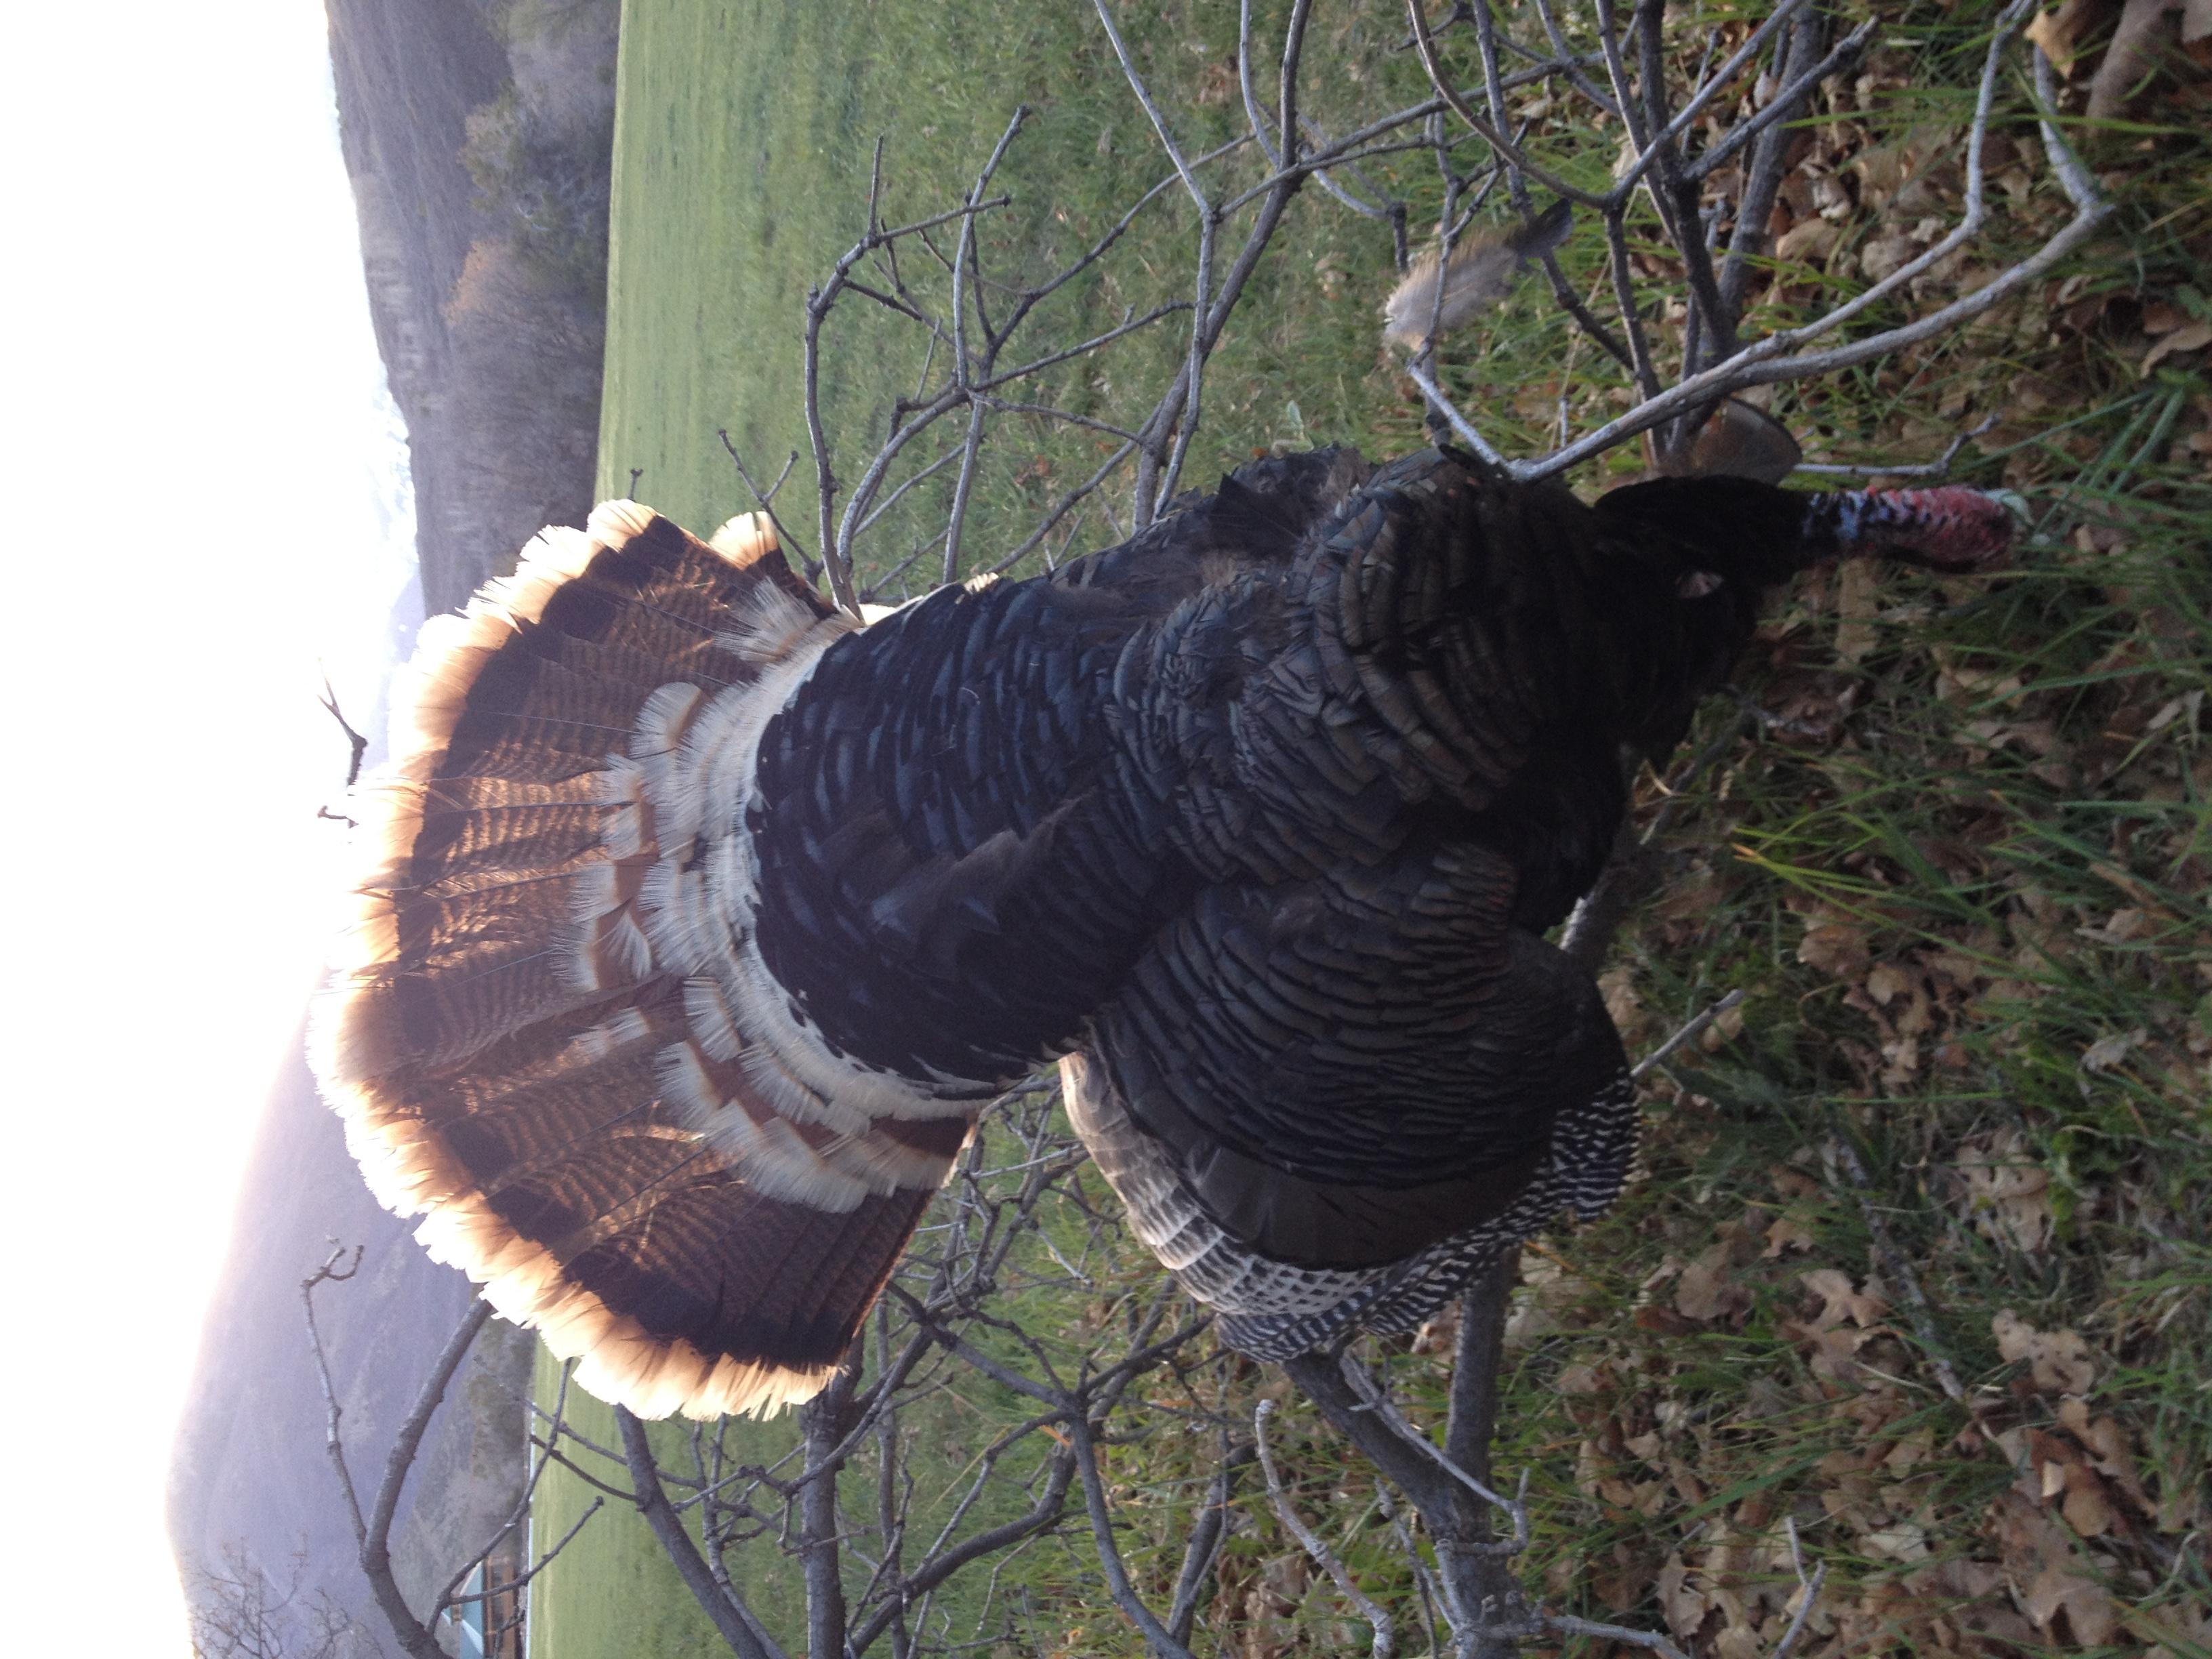 Colorado Turkey Hunting--A Landowner's Spring Bonus